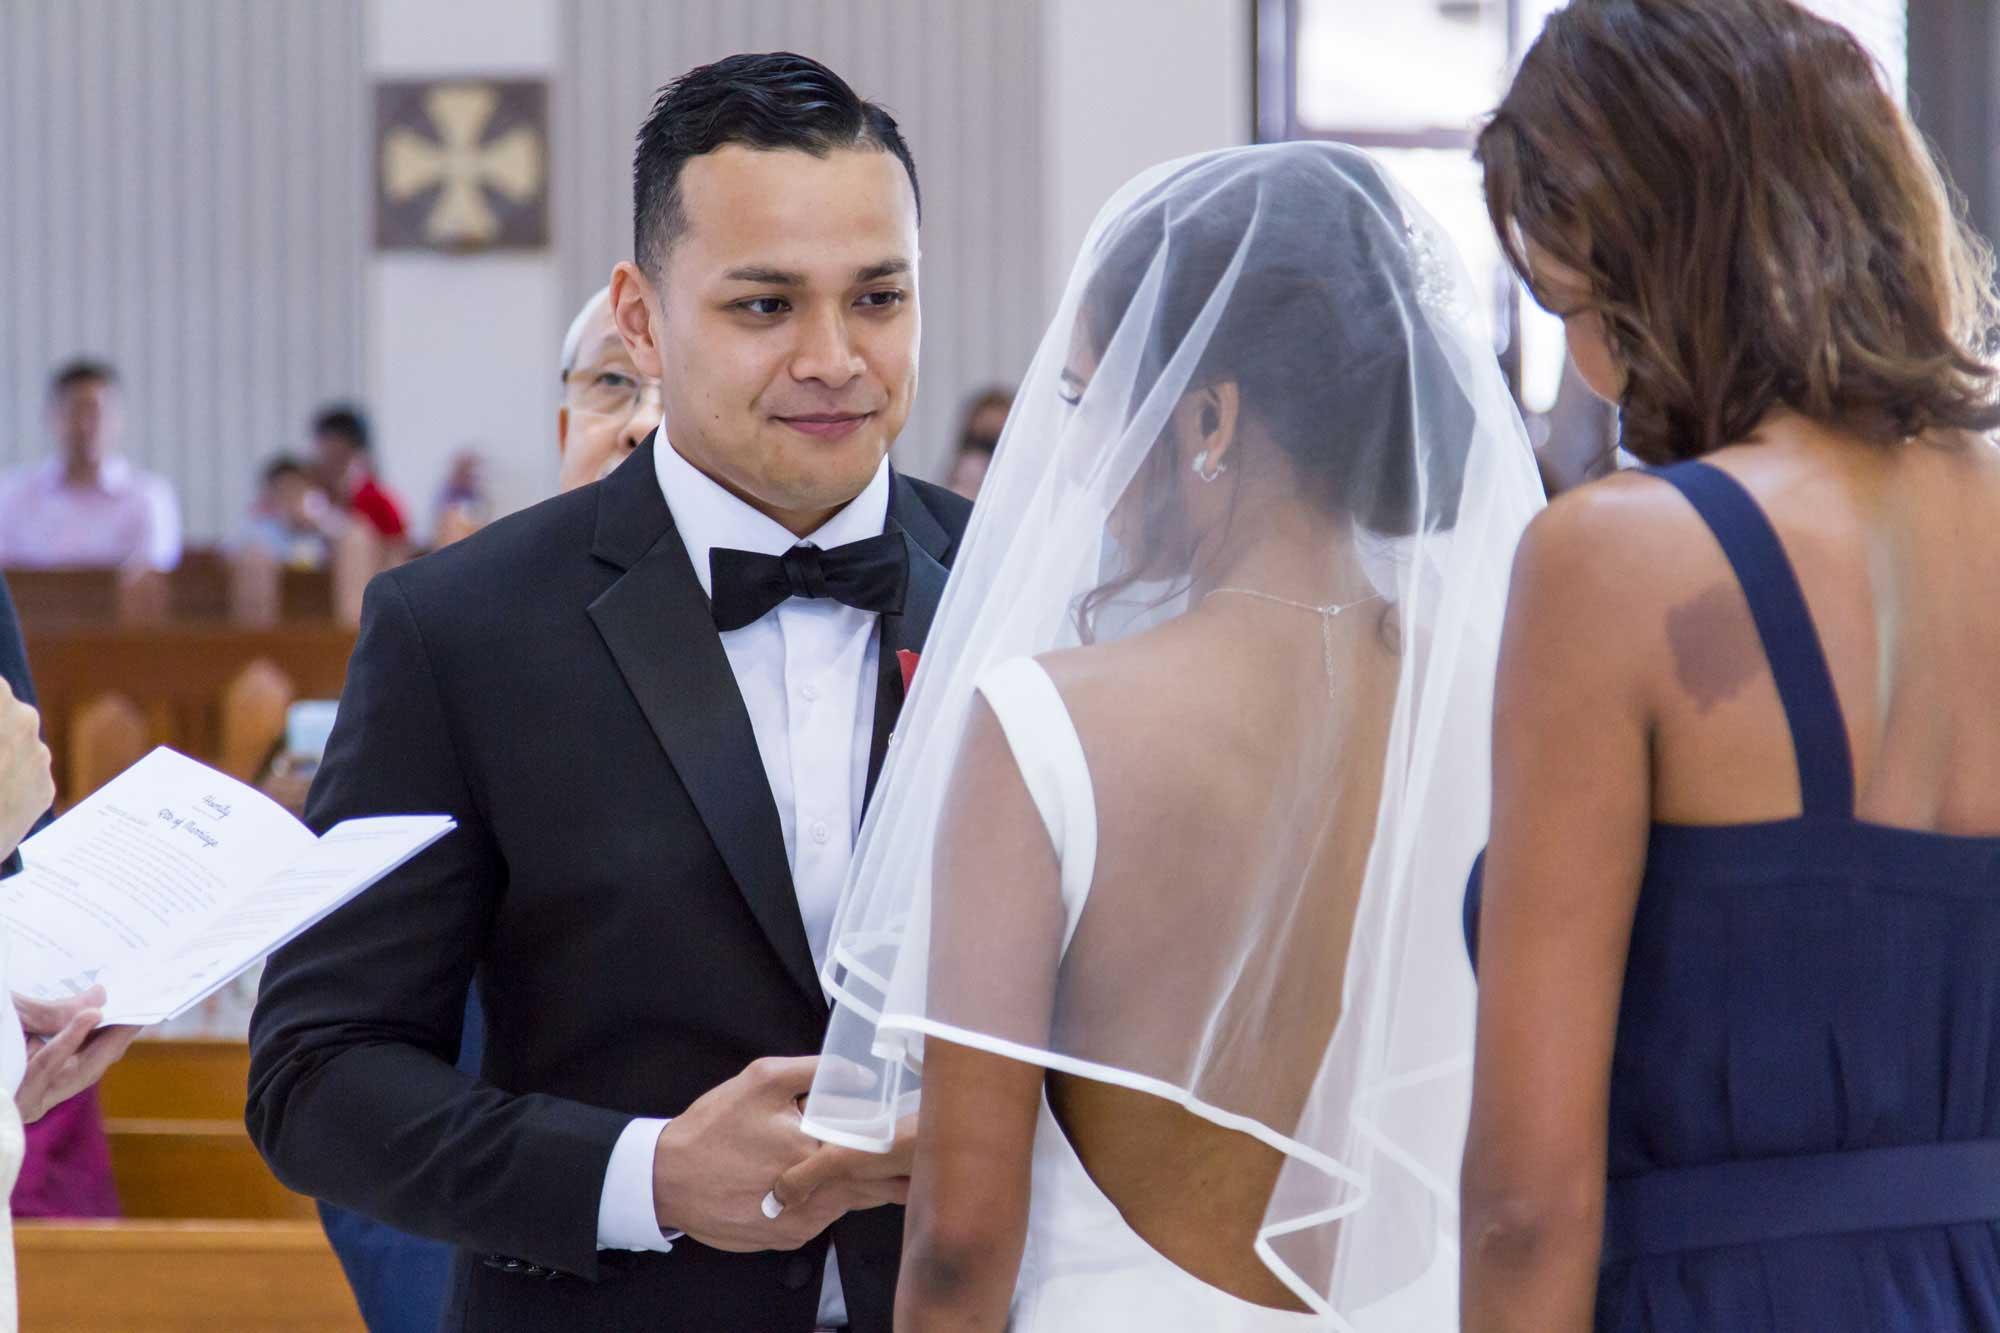 Church Wedding Photographer